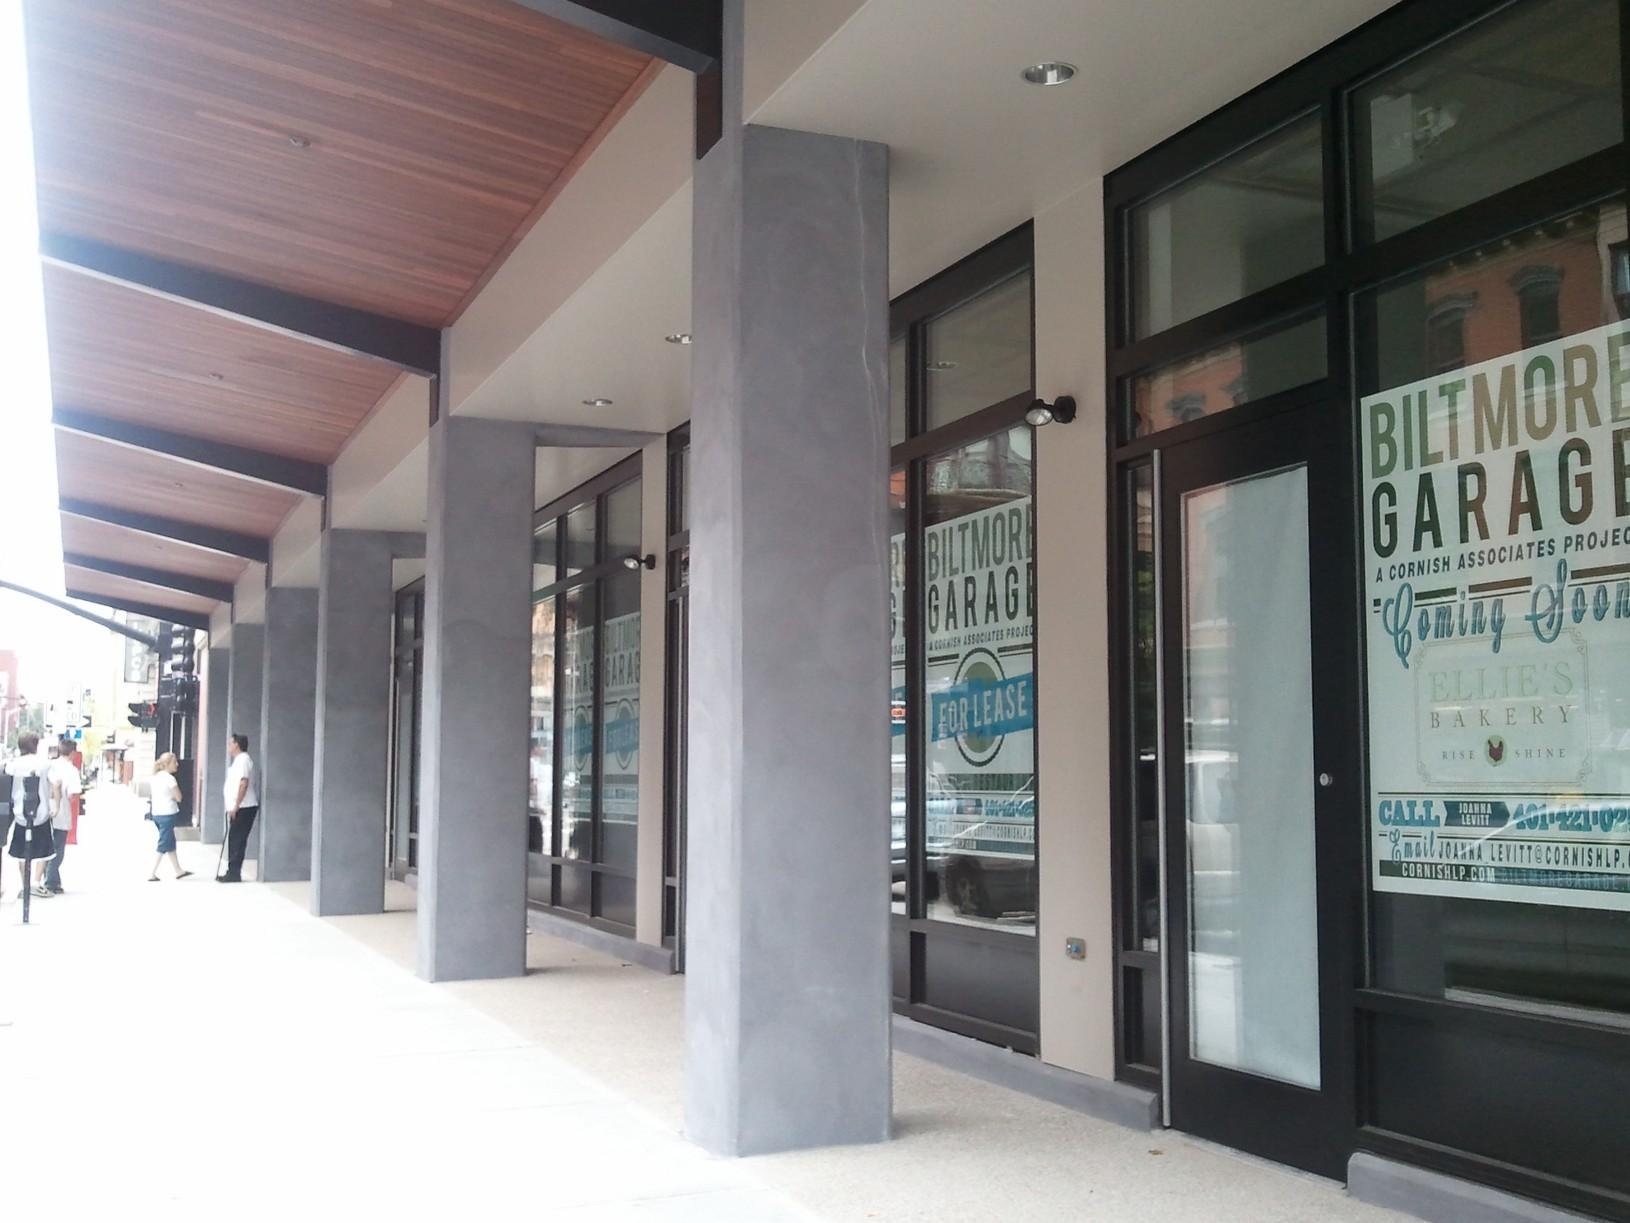 Biltmore garage prepares for 6 new retail units downtown providence biltmore garage prepares for 6 new retail units rubansaba